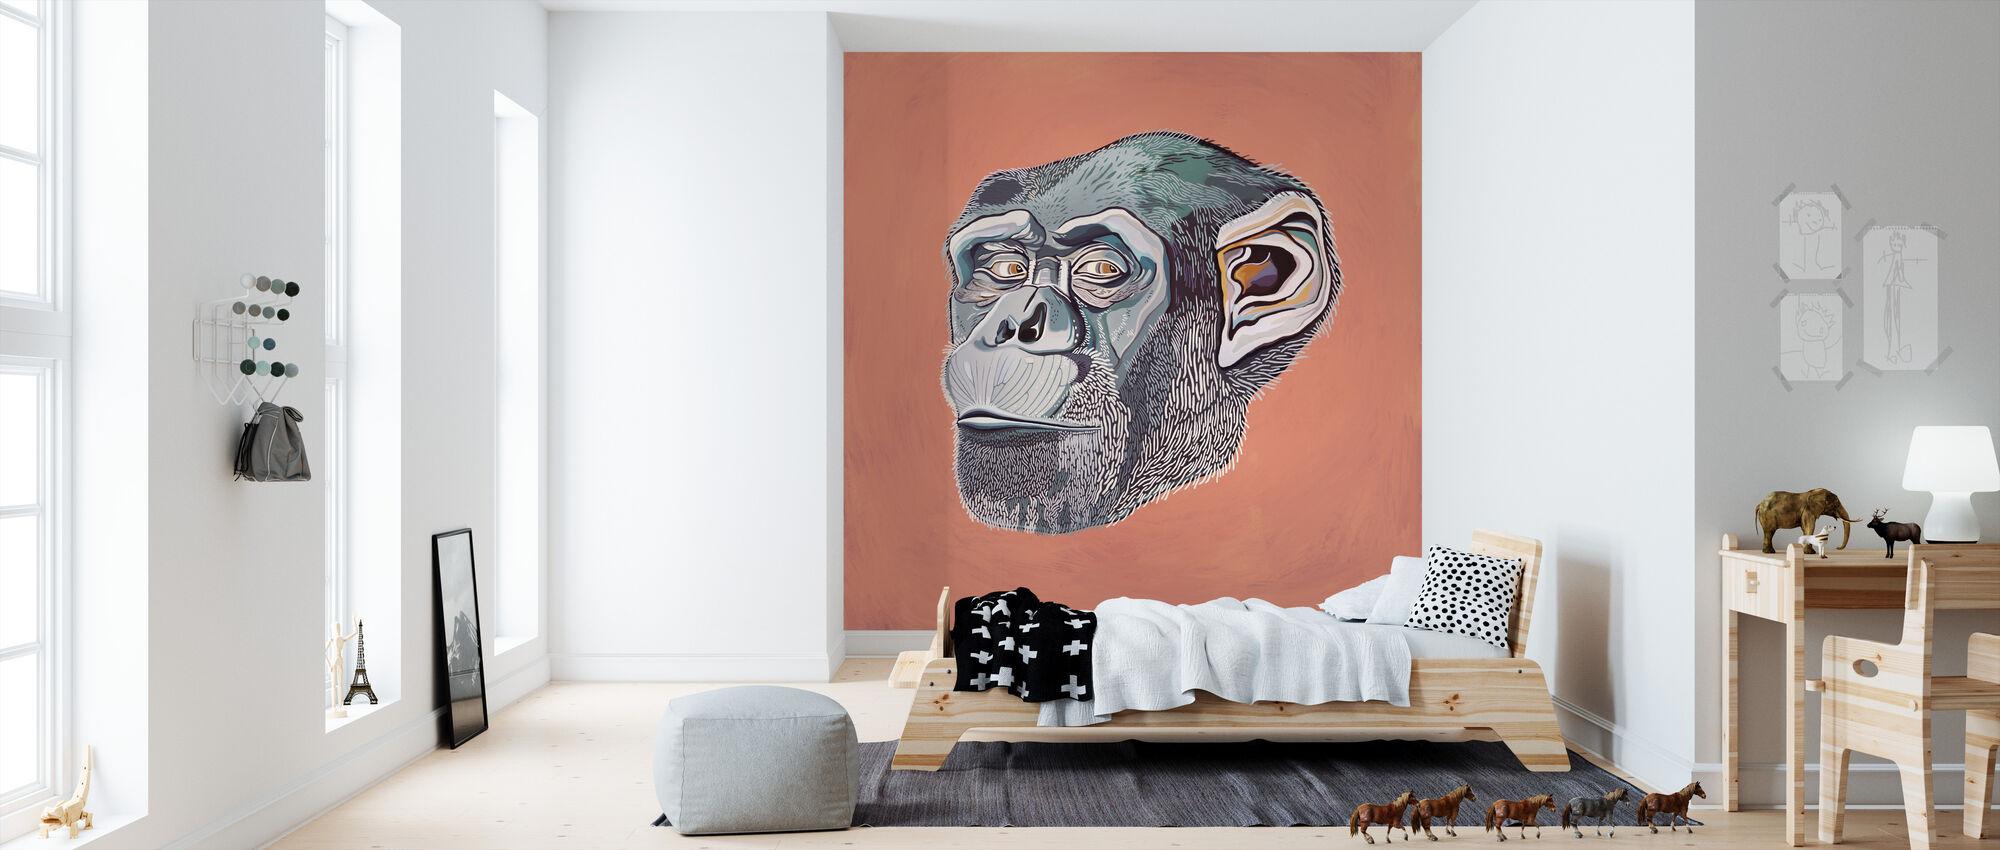 Ape - Wallpaper - Kids Room